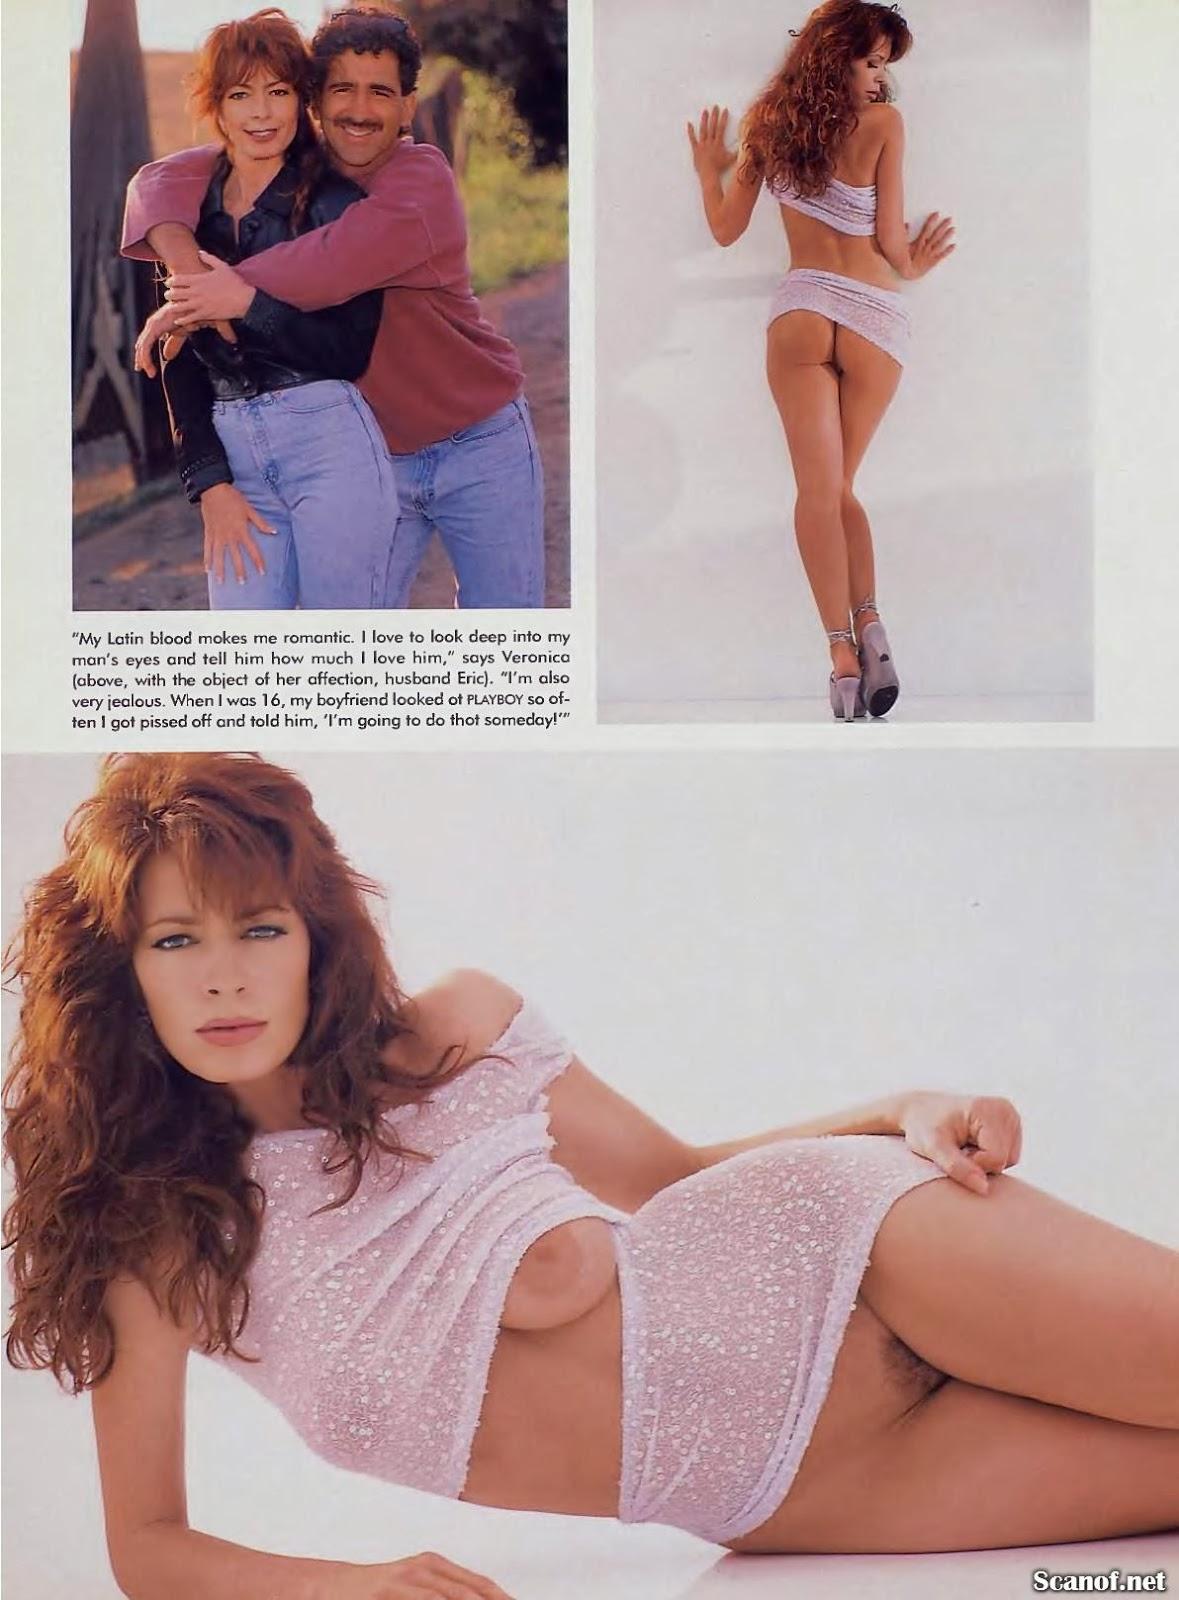 veronica gamba playboy usa may 1998 boob press photos